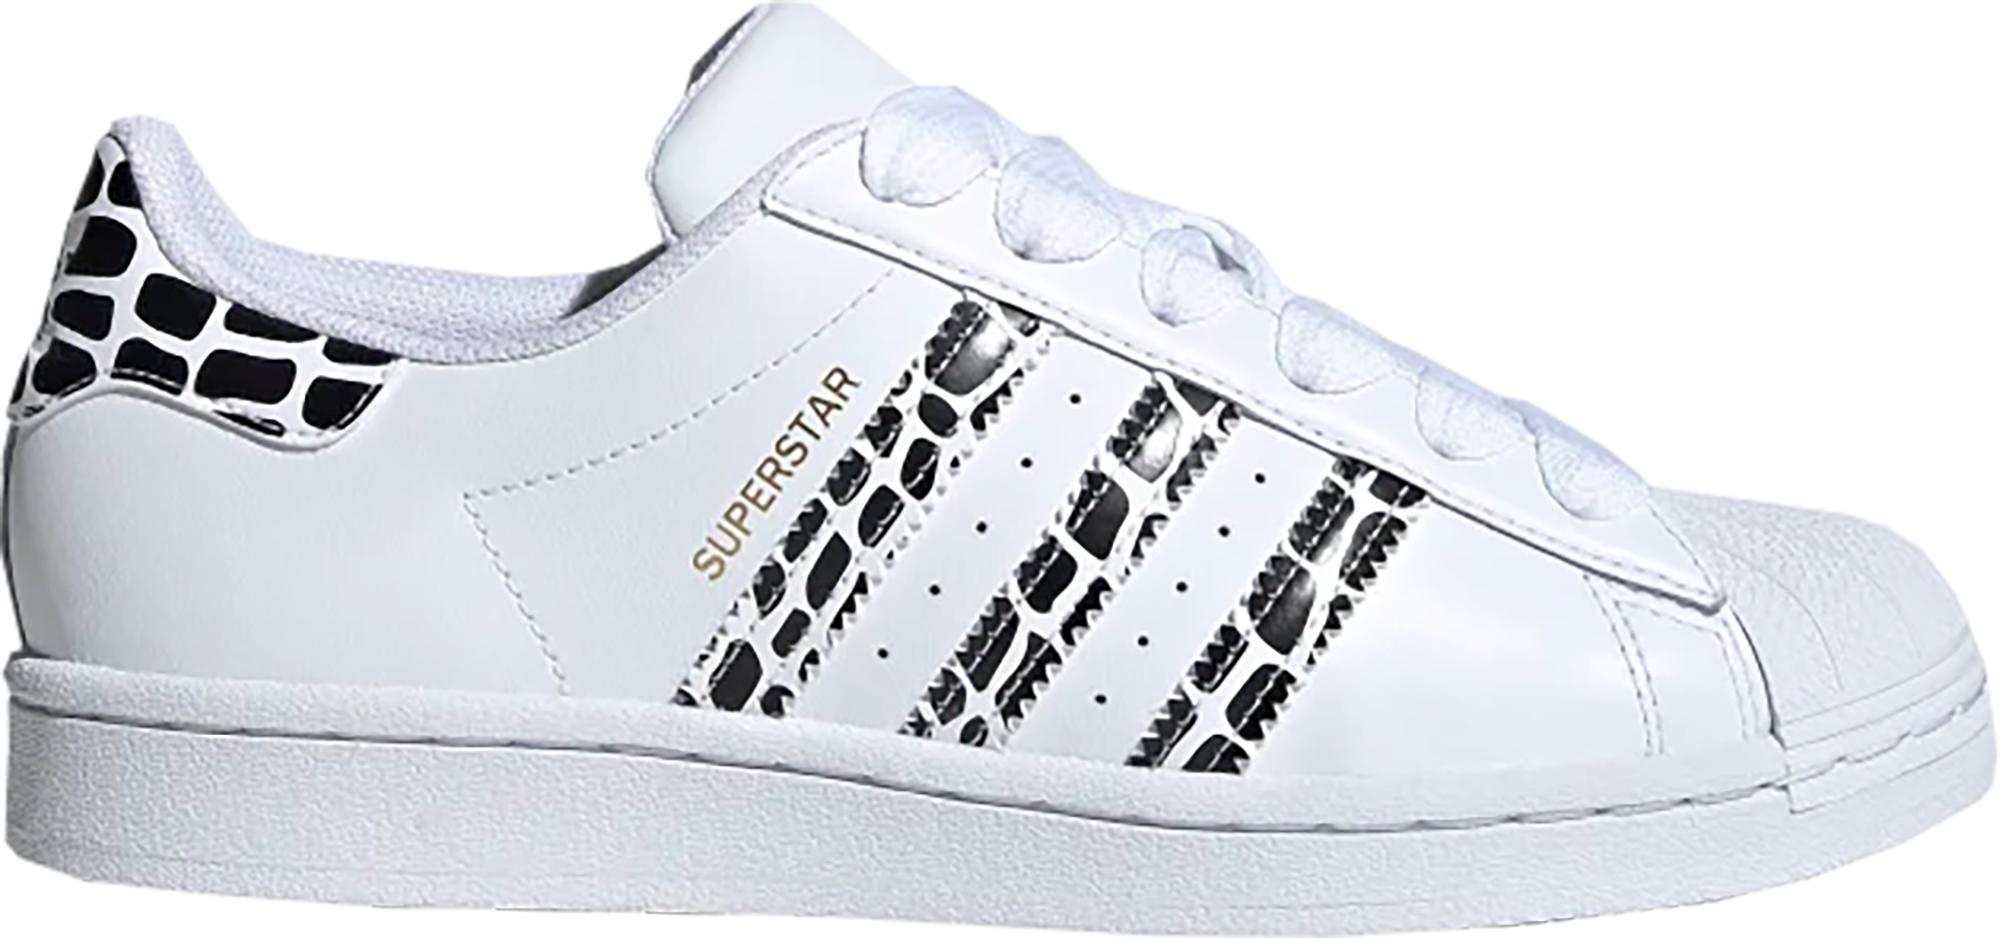 Adidas Superstar Leopard Stripes Flash Sales, UP TO 58% OFF